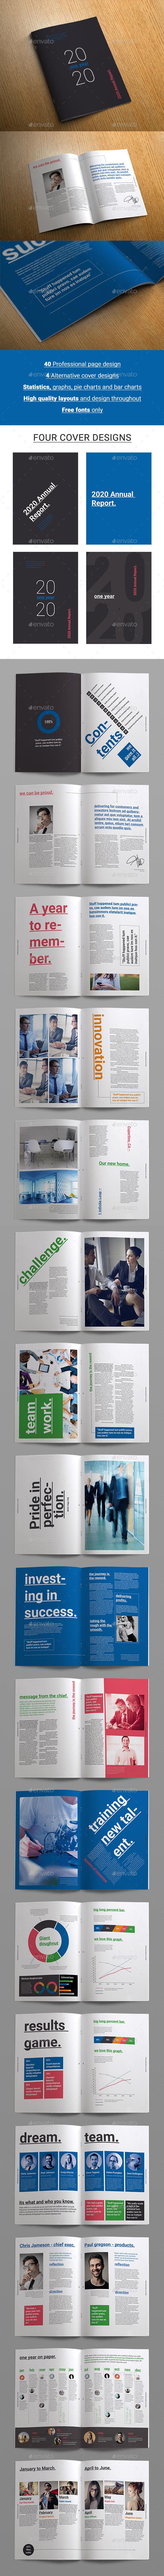 Roboto Annual Report - Informational Brochures